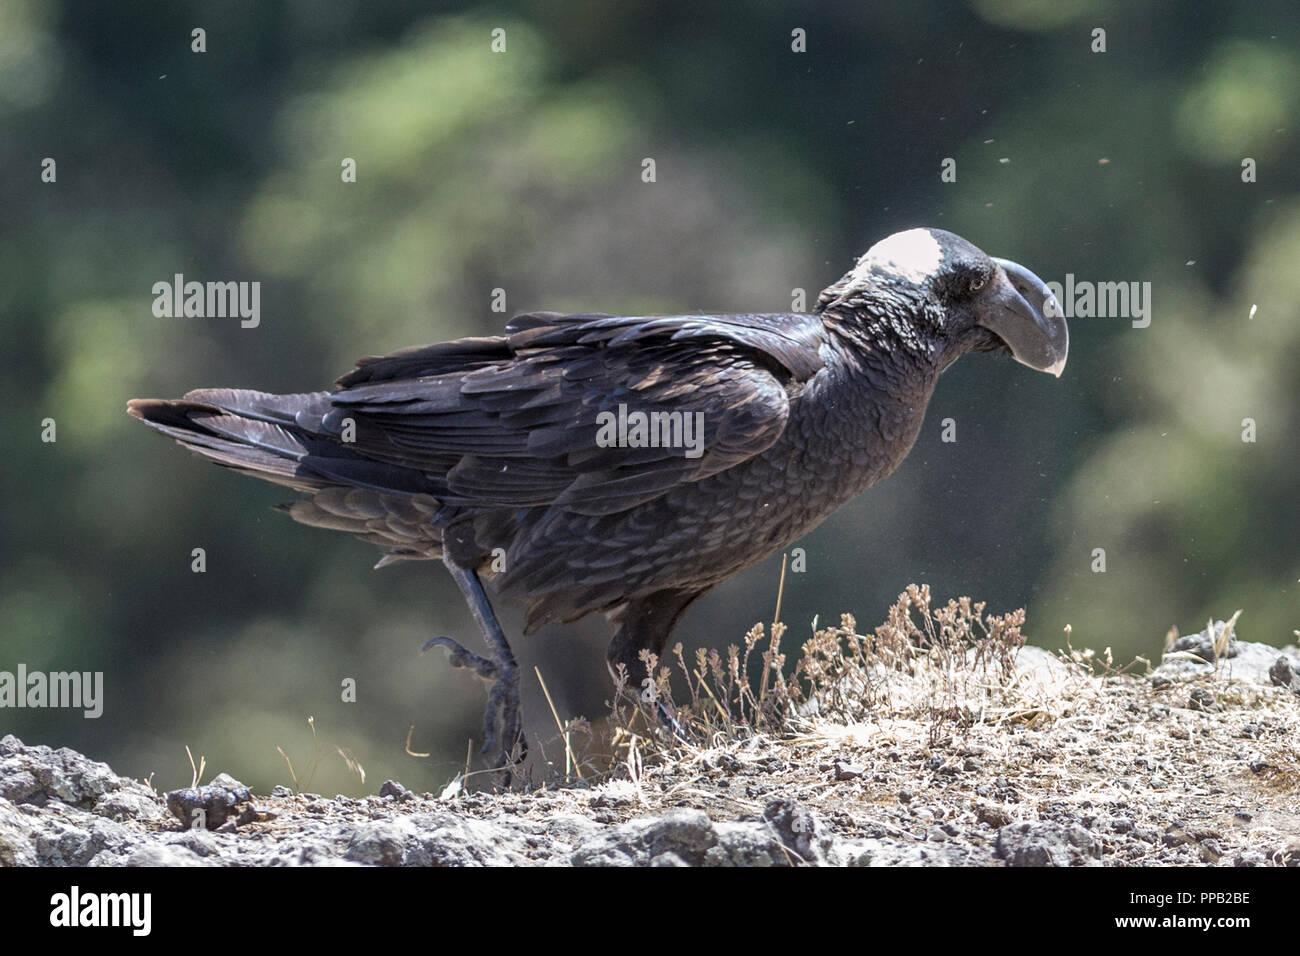 Thick-billed raven, Corvus crassirostris,  Simiens National Park, Ethiopia - Stock Image